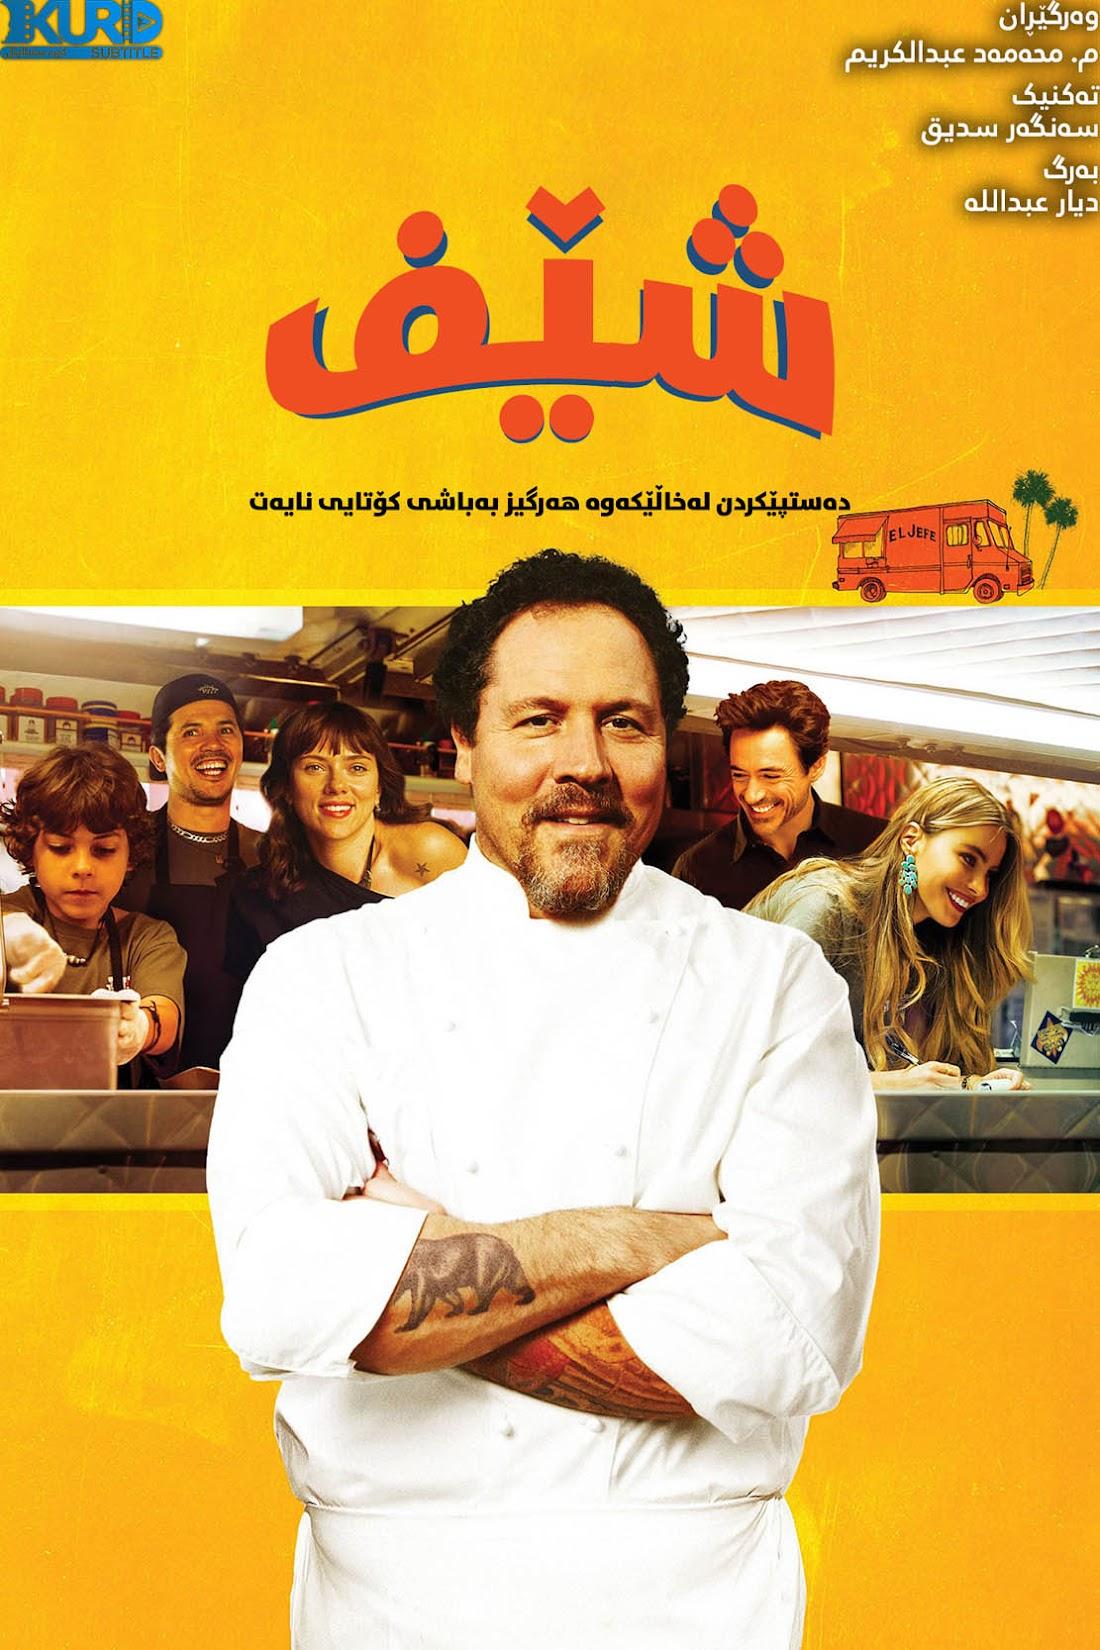 Chef kurdish poster